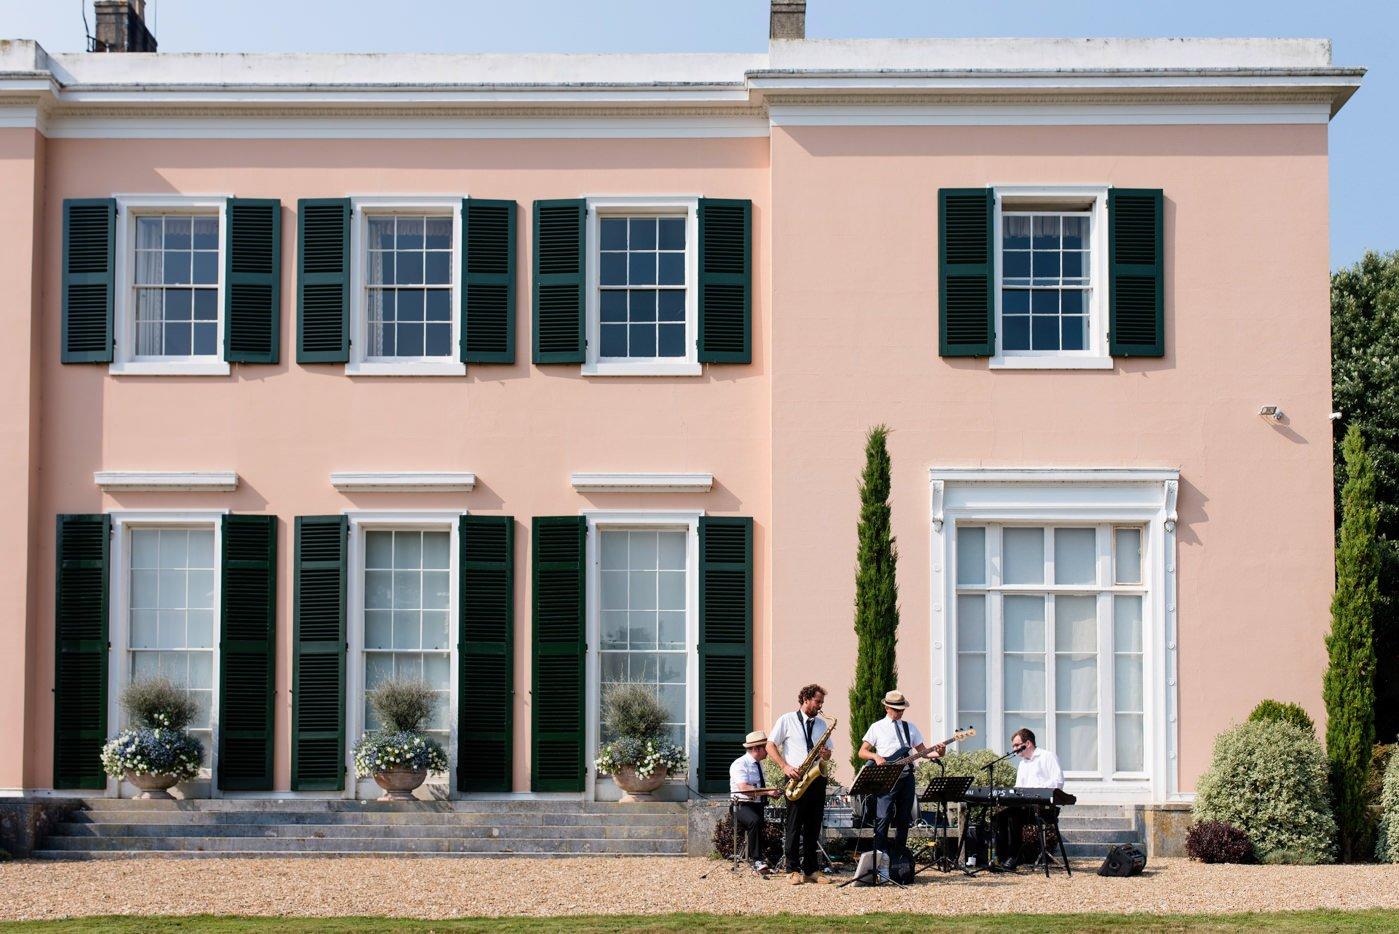 bignor-park-wedding-photography-robyn-and-tom-62